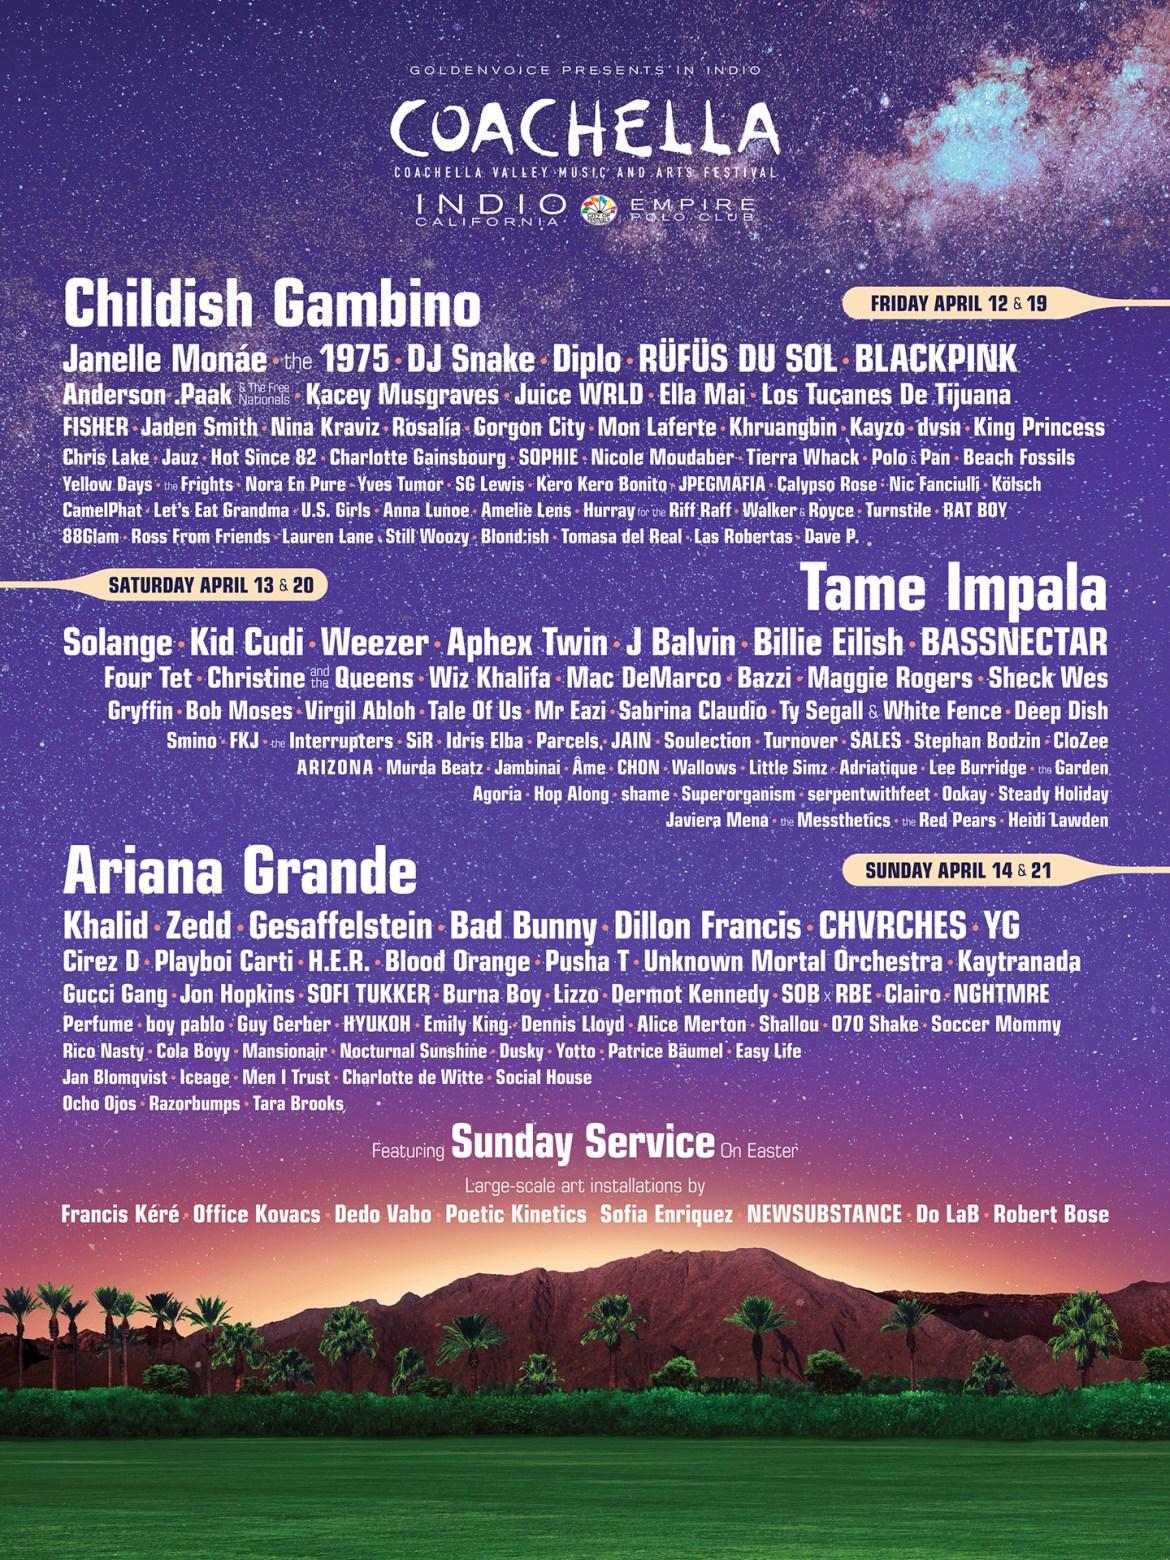 coa 2019 2400x3200 v9b NN sml - Tips para vivir una experiencia Robb en Coachella 2019